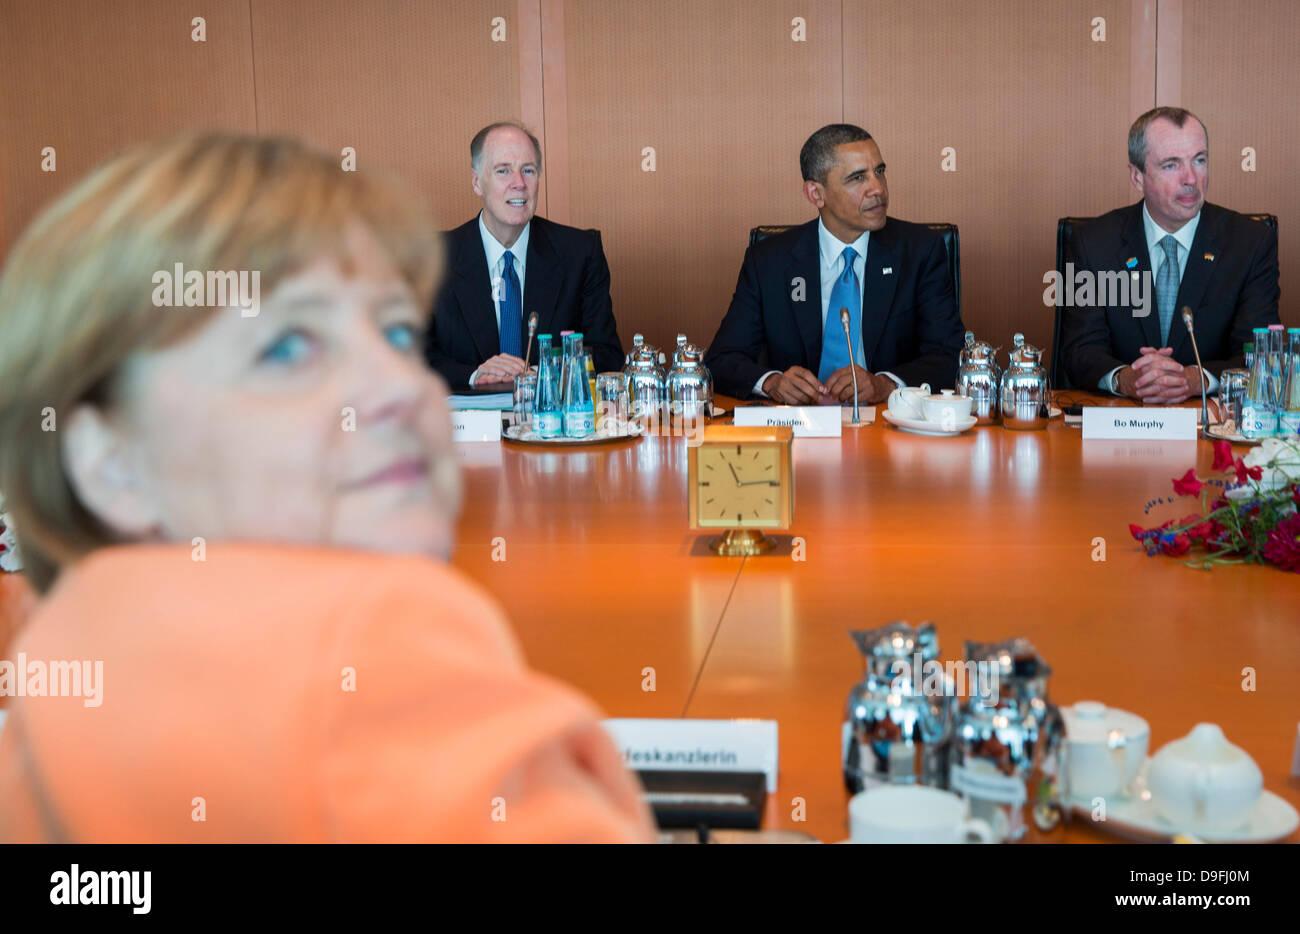 From left, German Chancellor Angela Merkel, National Security Advisor Thomas Donilon, US President Barack Obama - Stock Image